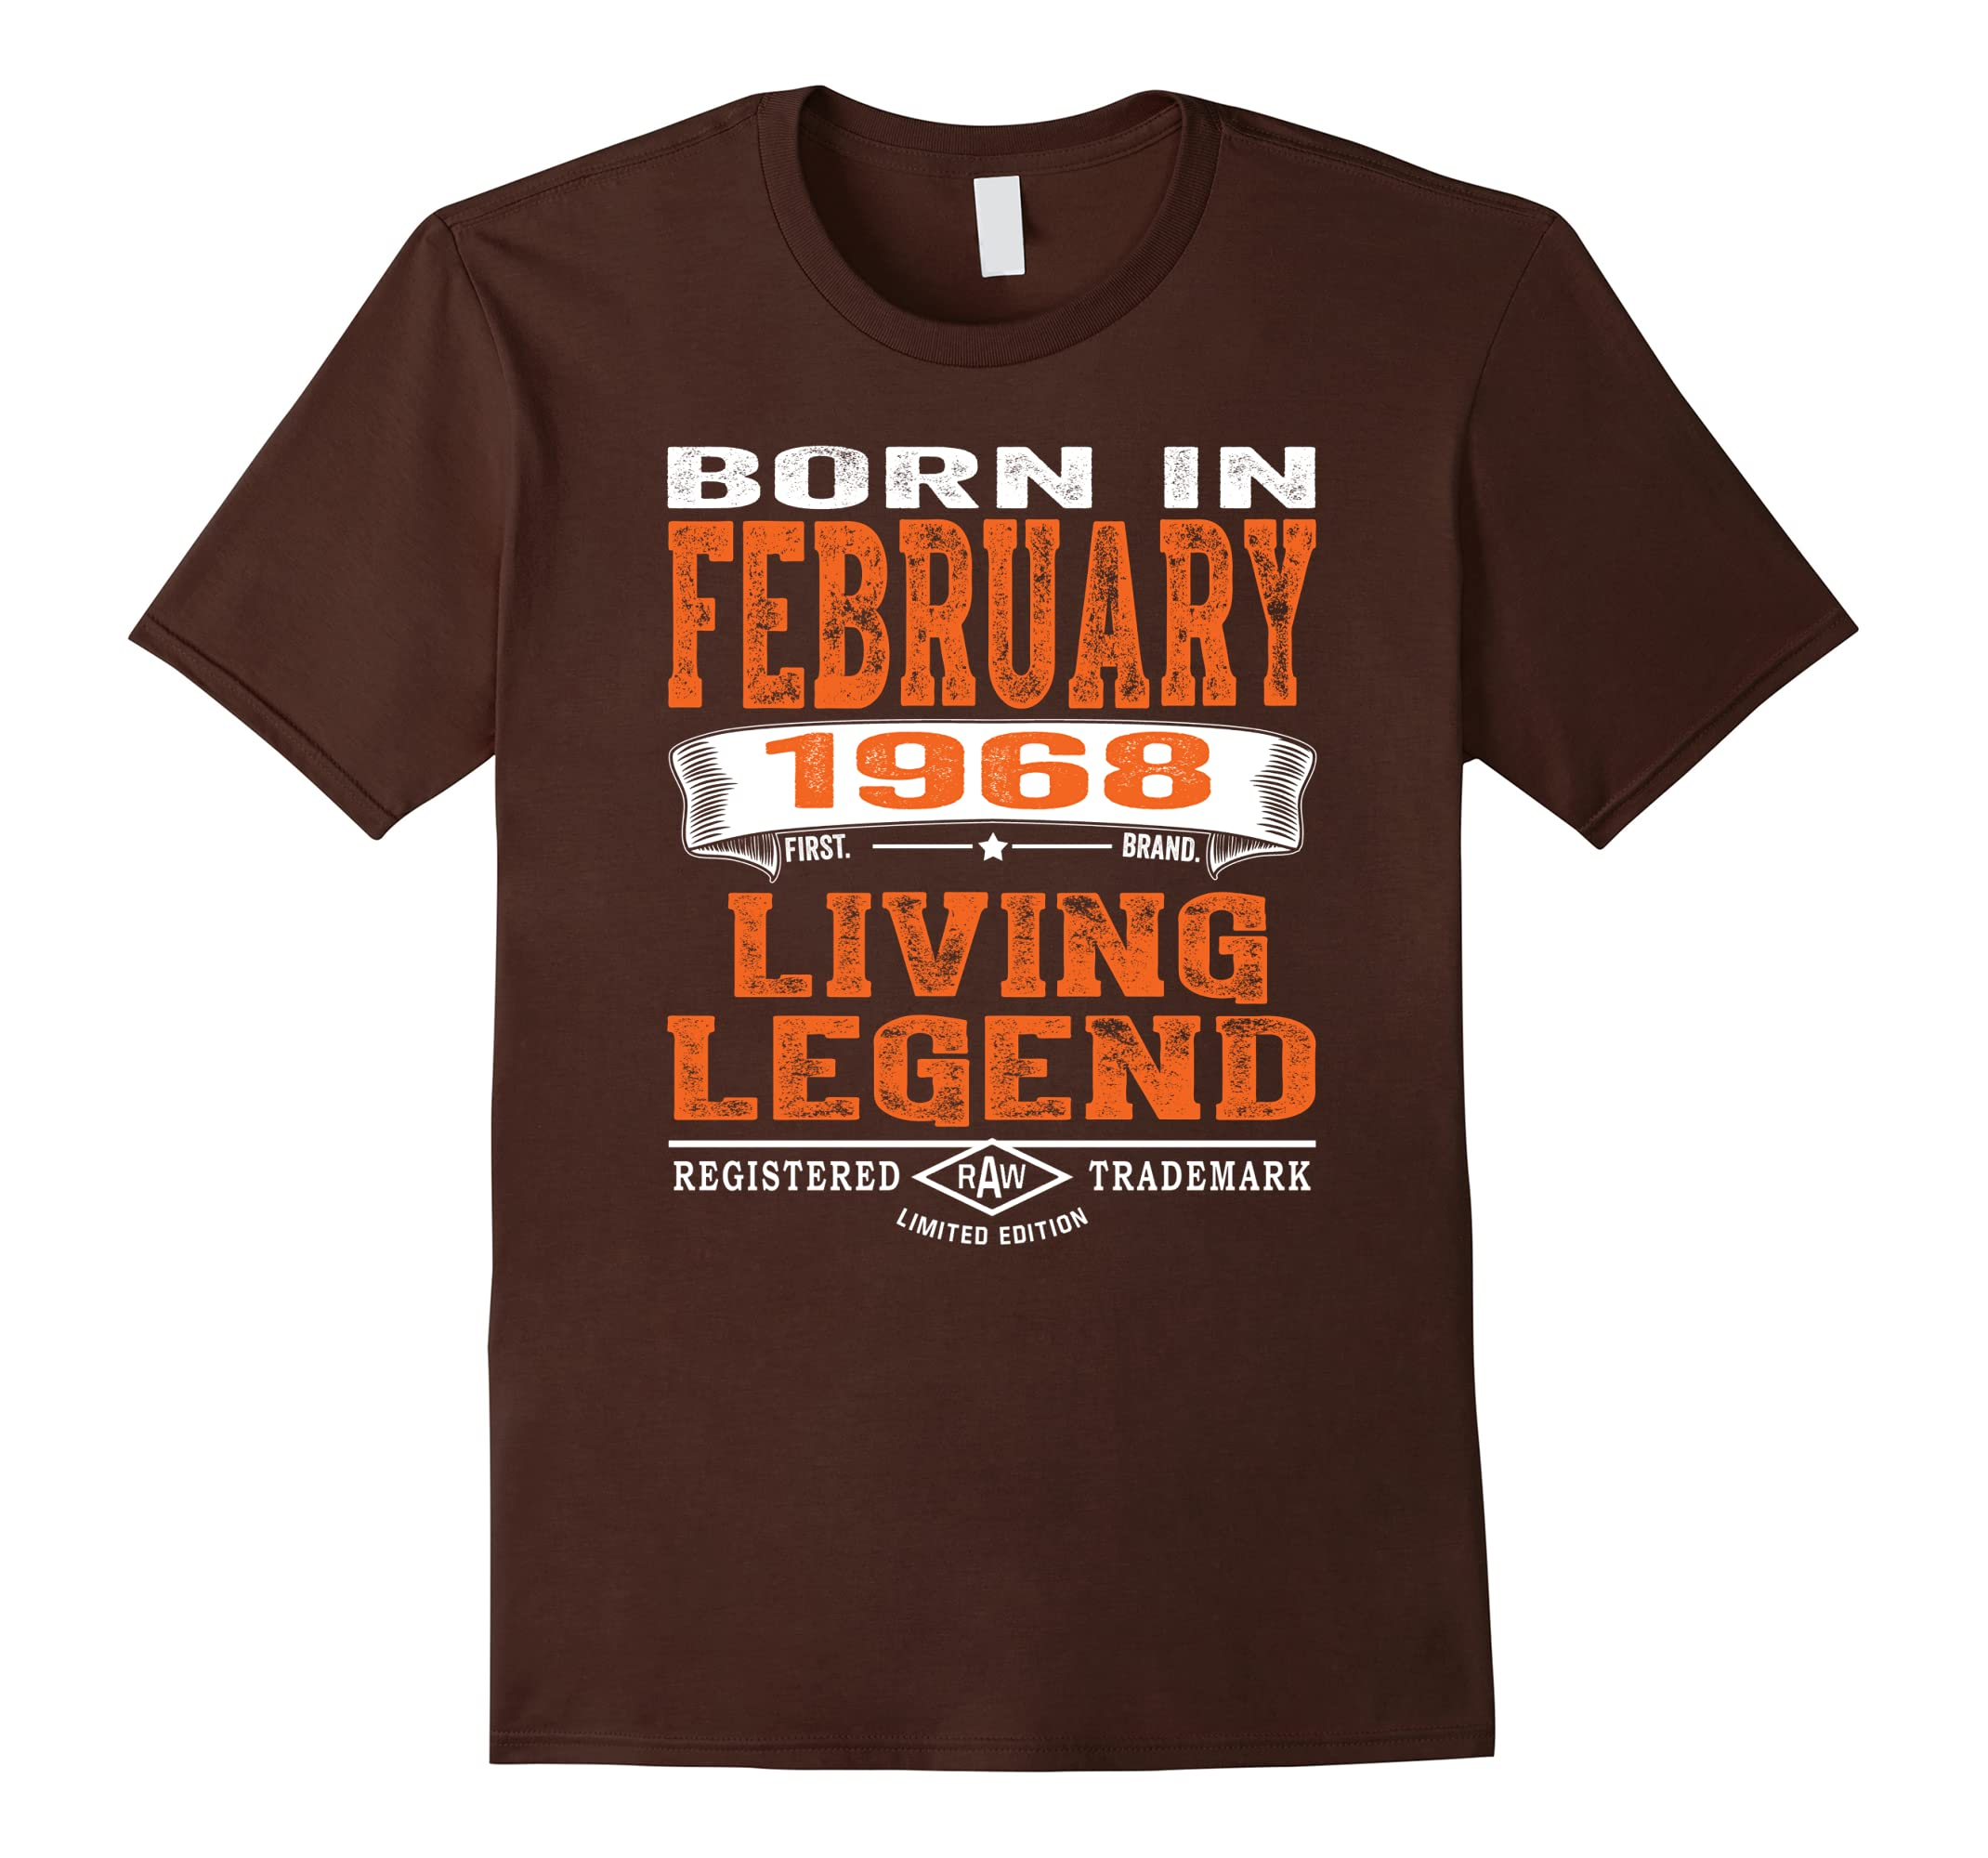 Mens 50th Birthday Gifts Men February 1968 Living Legend T Shirt Ah My One